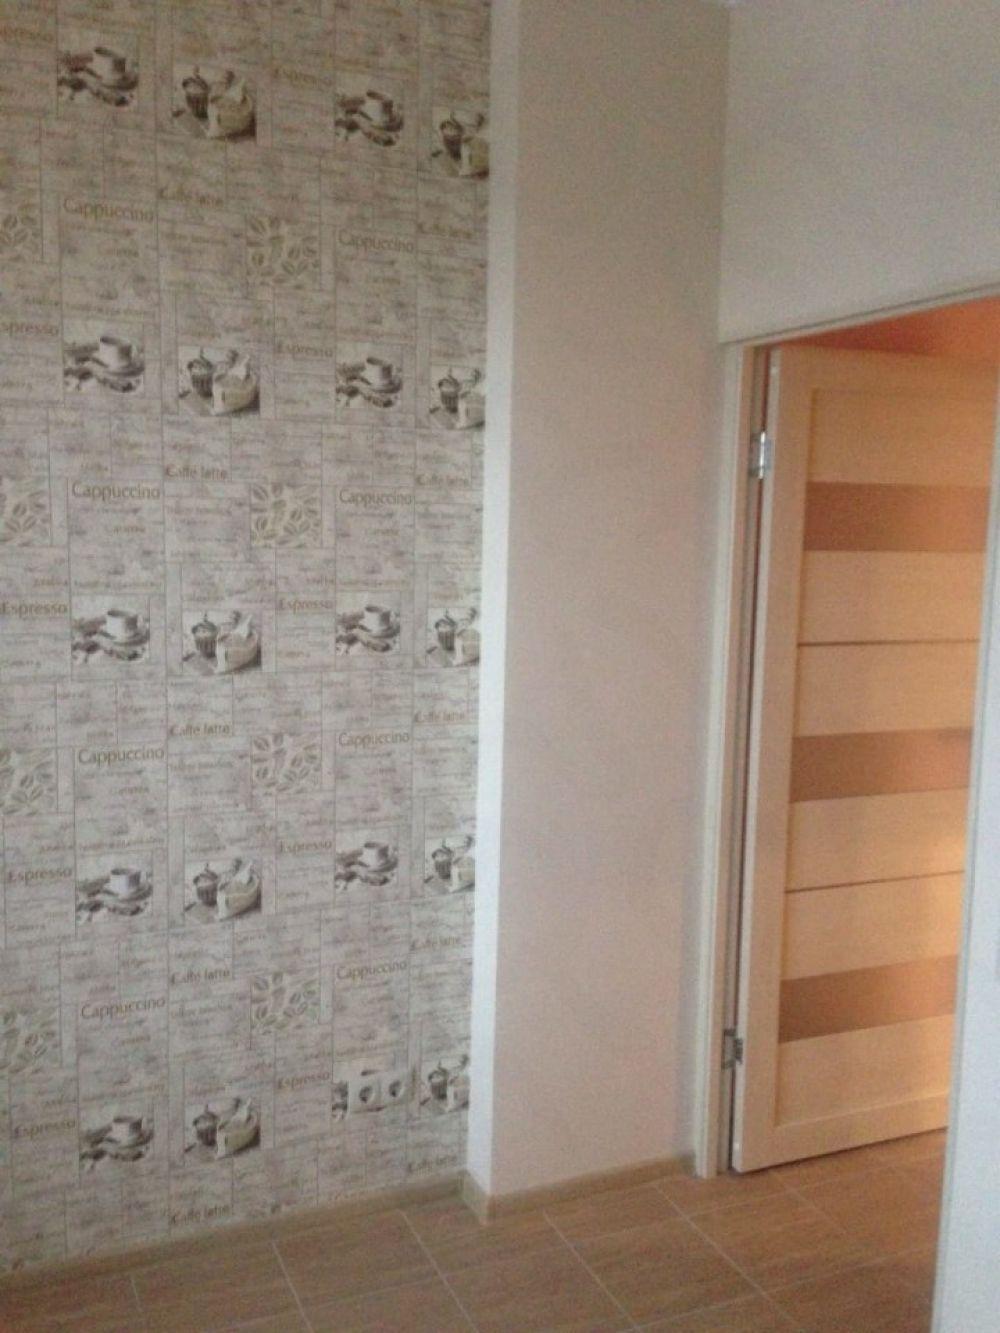 1-к квартира, пос. Свердловский ЖК Лукино-Варино, ул. Заречная, фото 2